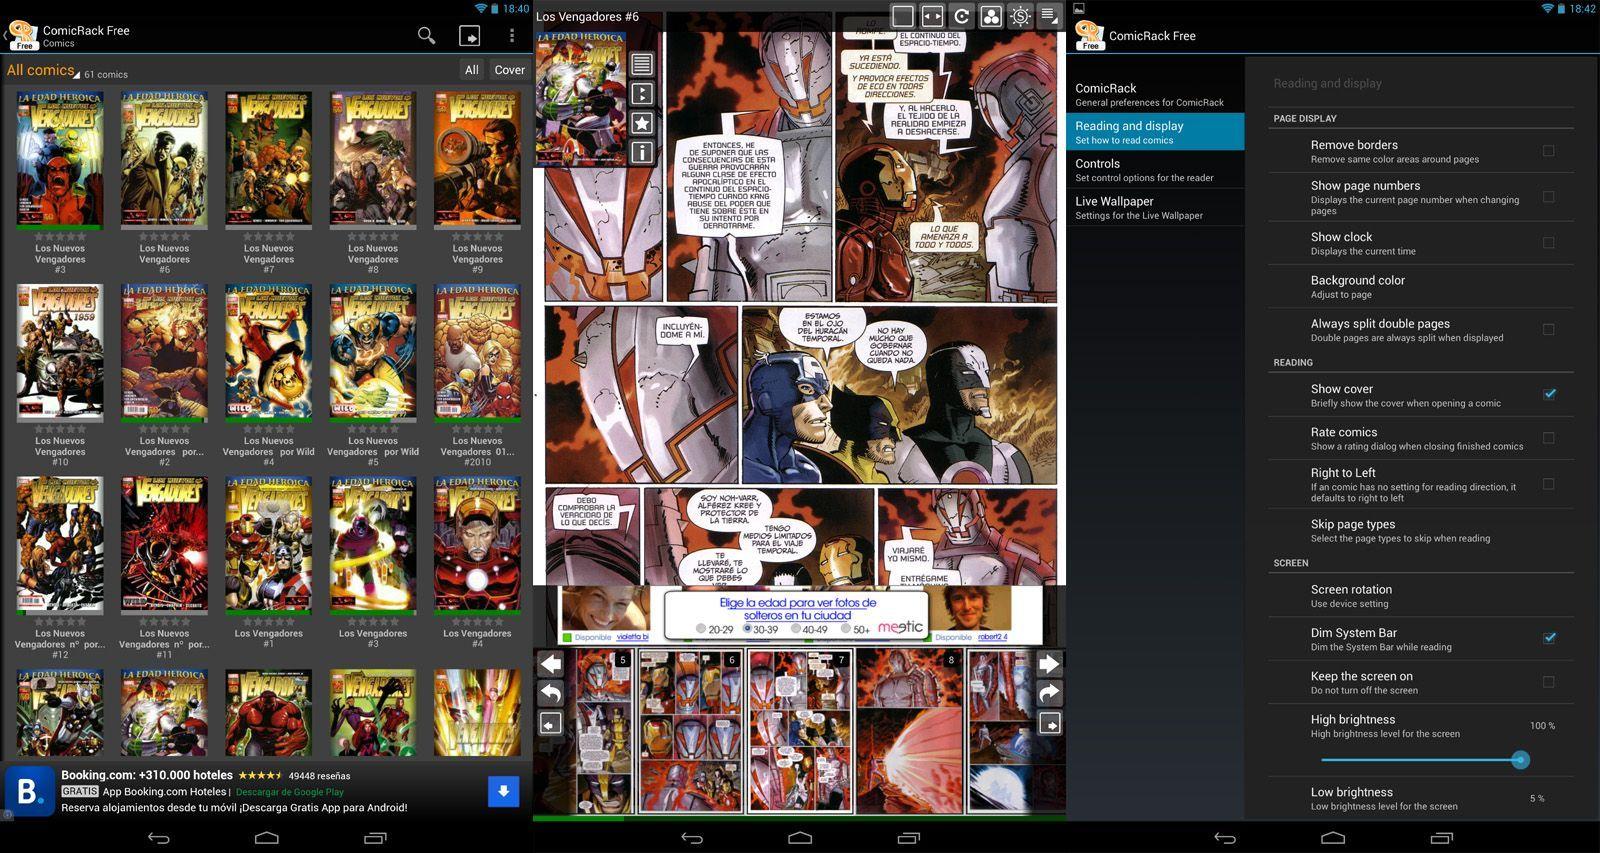 Comicrack free screenshots